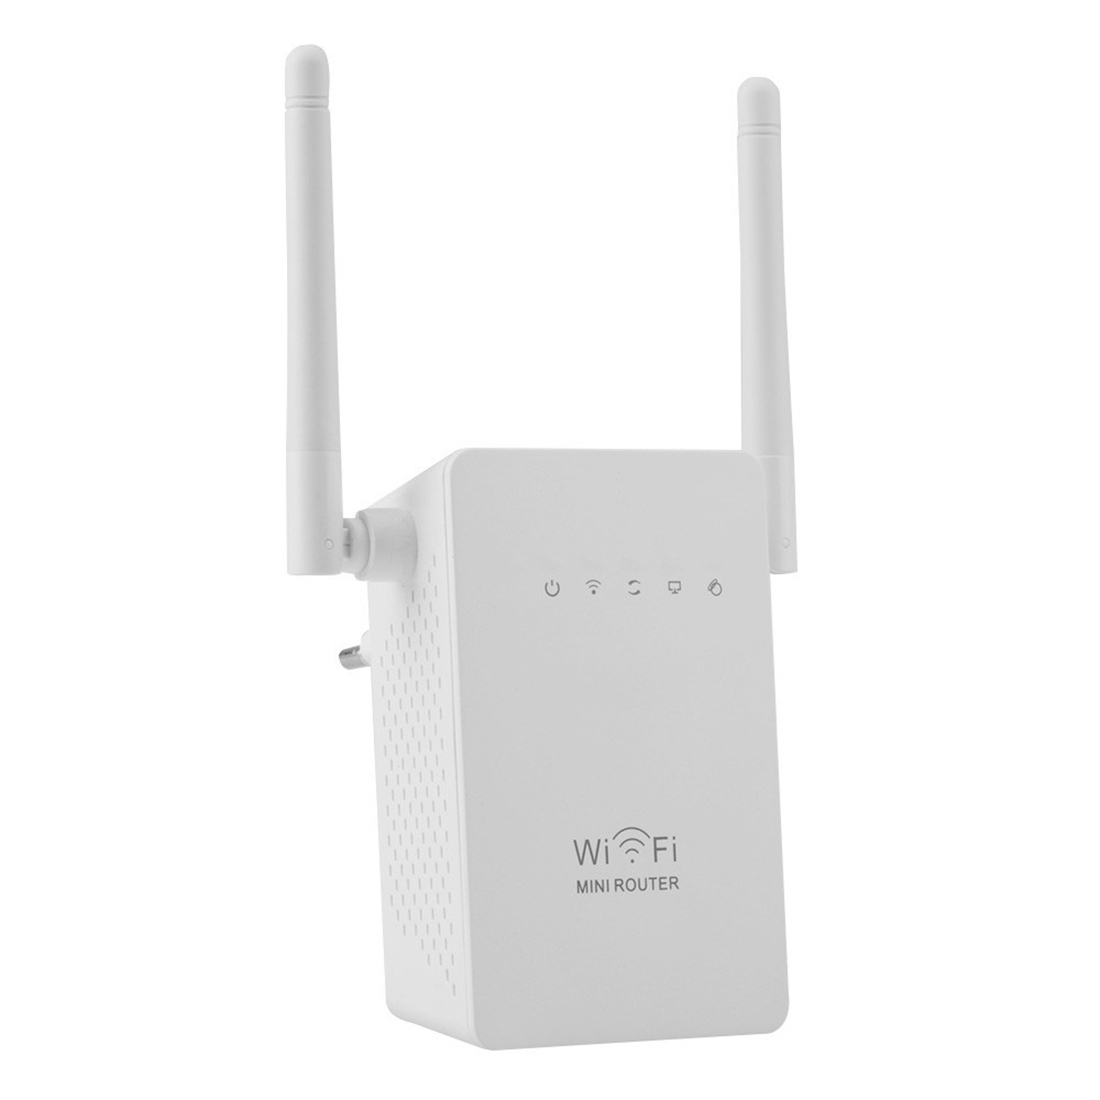 NOYOKERE Noul 300Mbps Repeater WiFi Network Extender Booster N300 Single Creșteți dublu antene externe EU US Plug